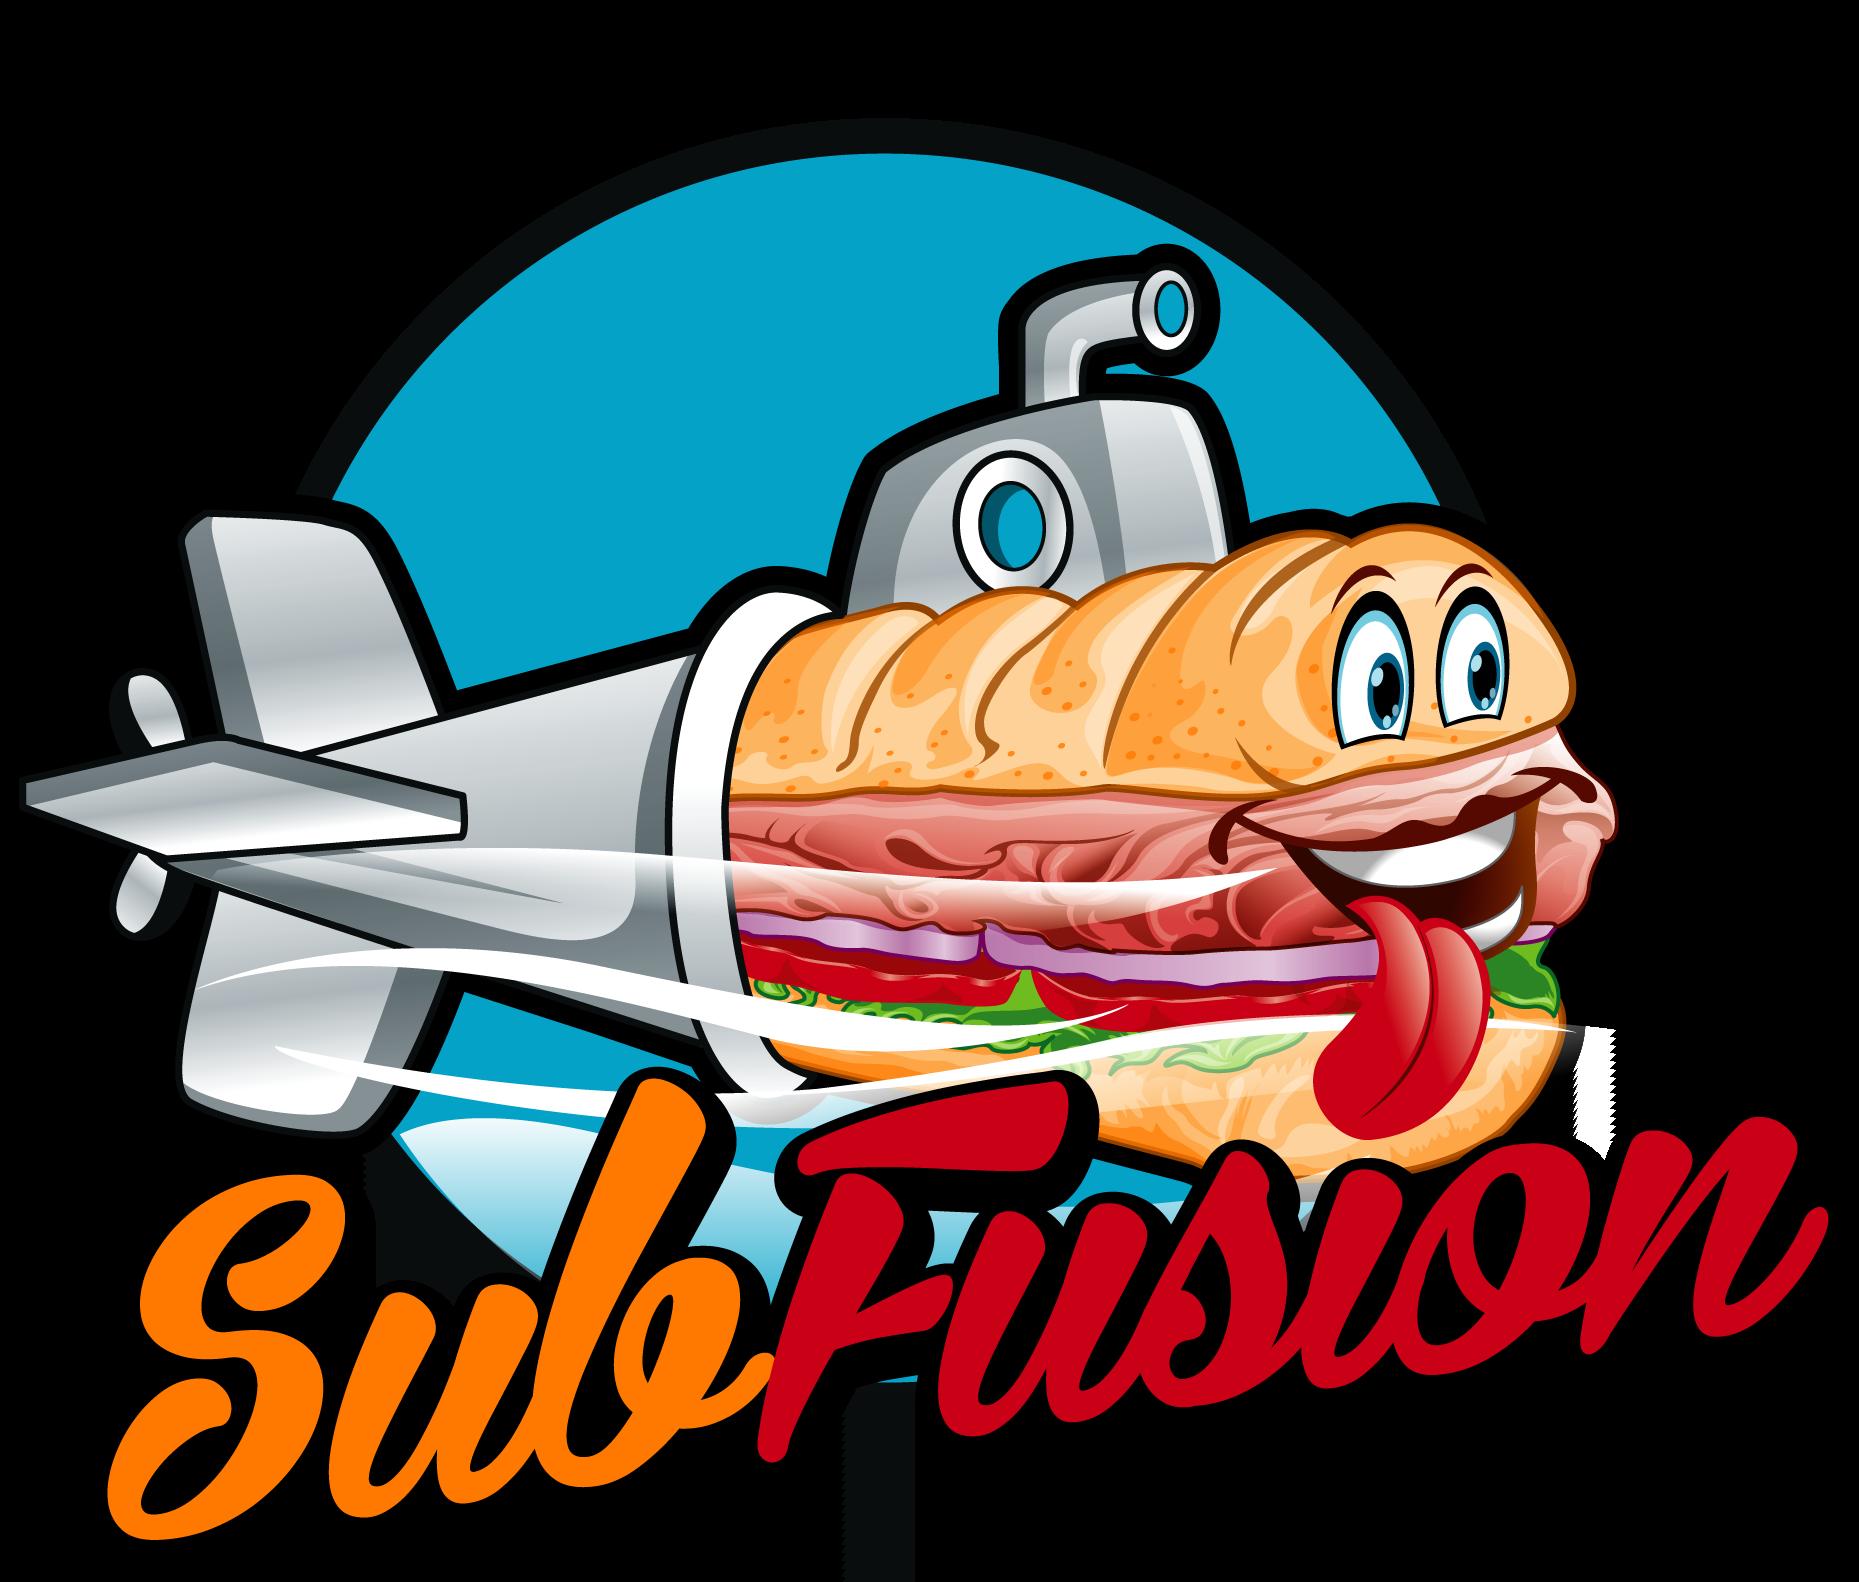 Sandwich clipart sub sandwich, Sandwich sub sandwich.